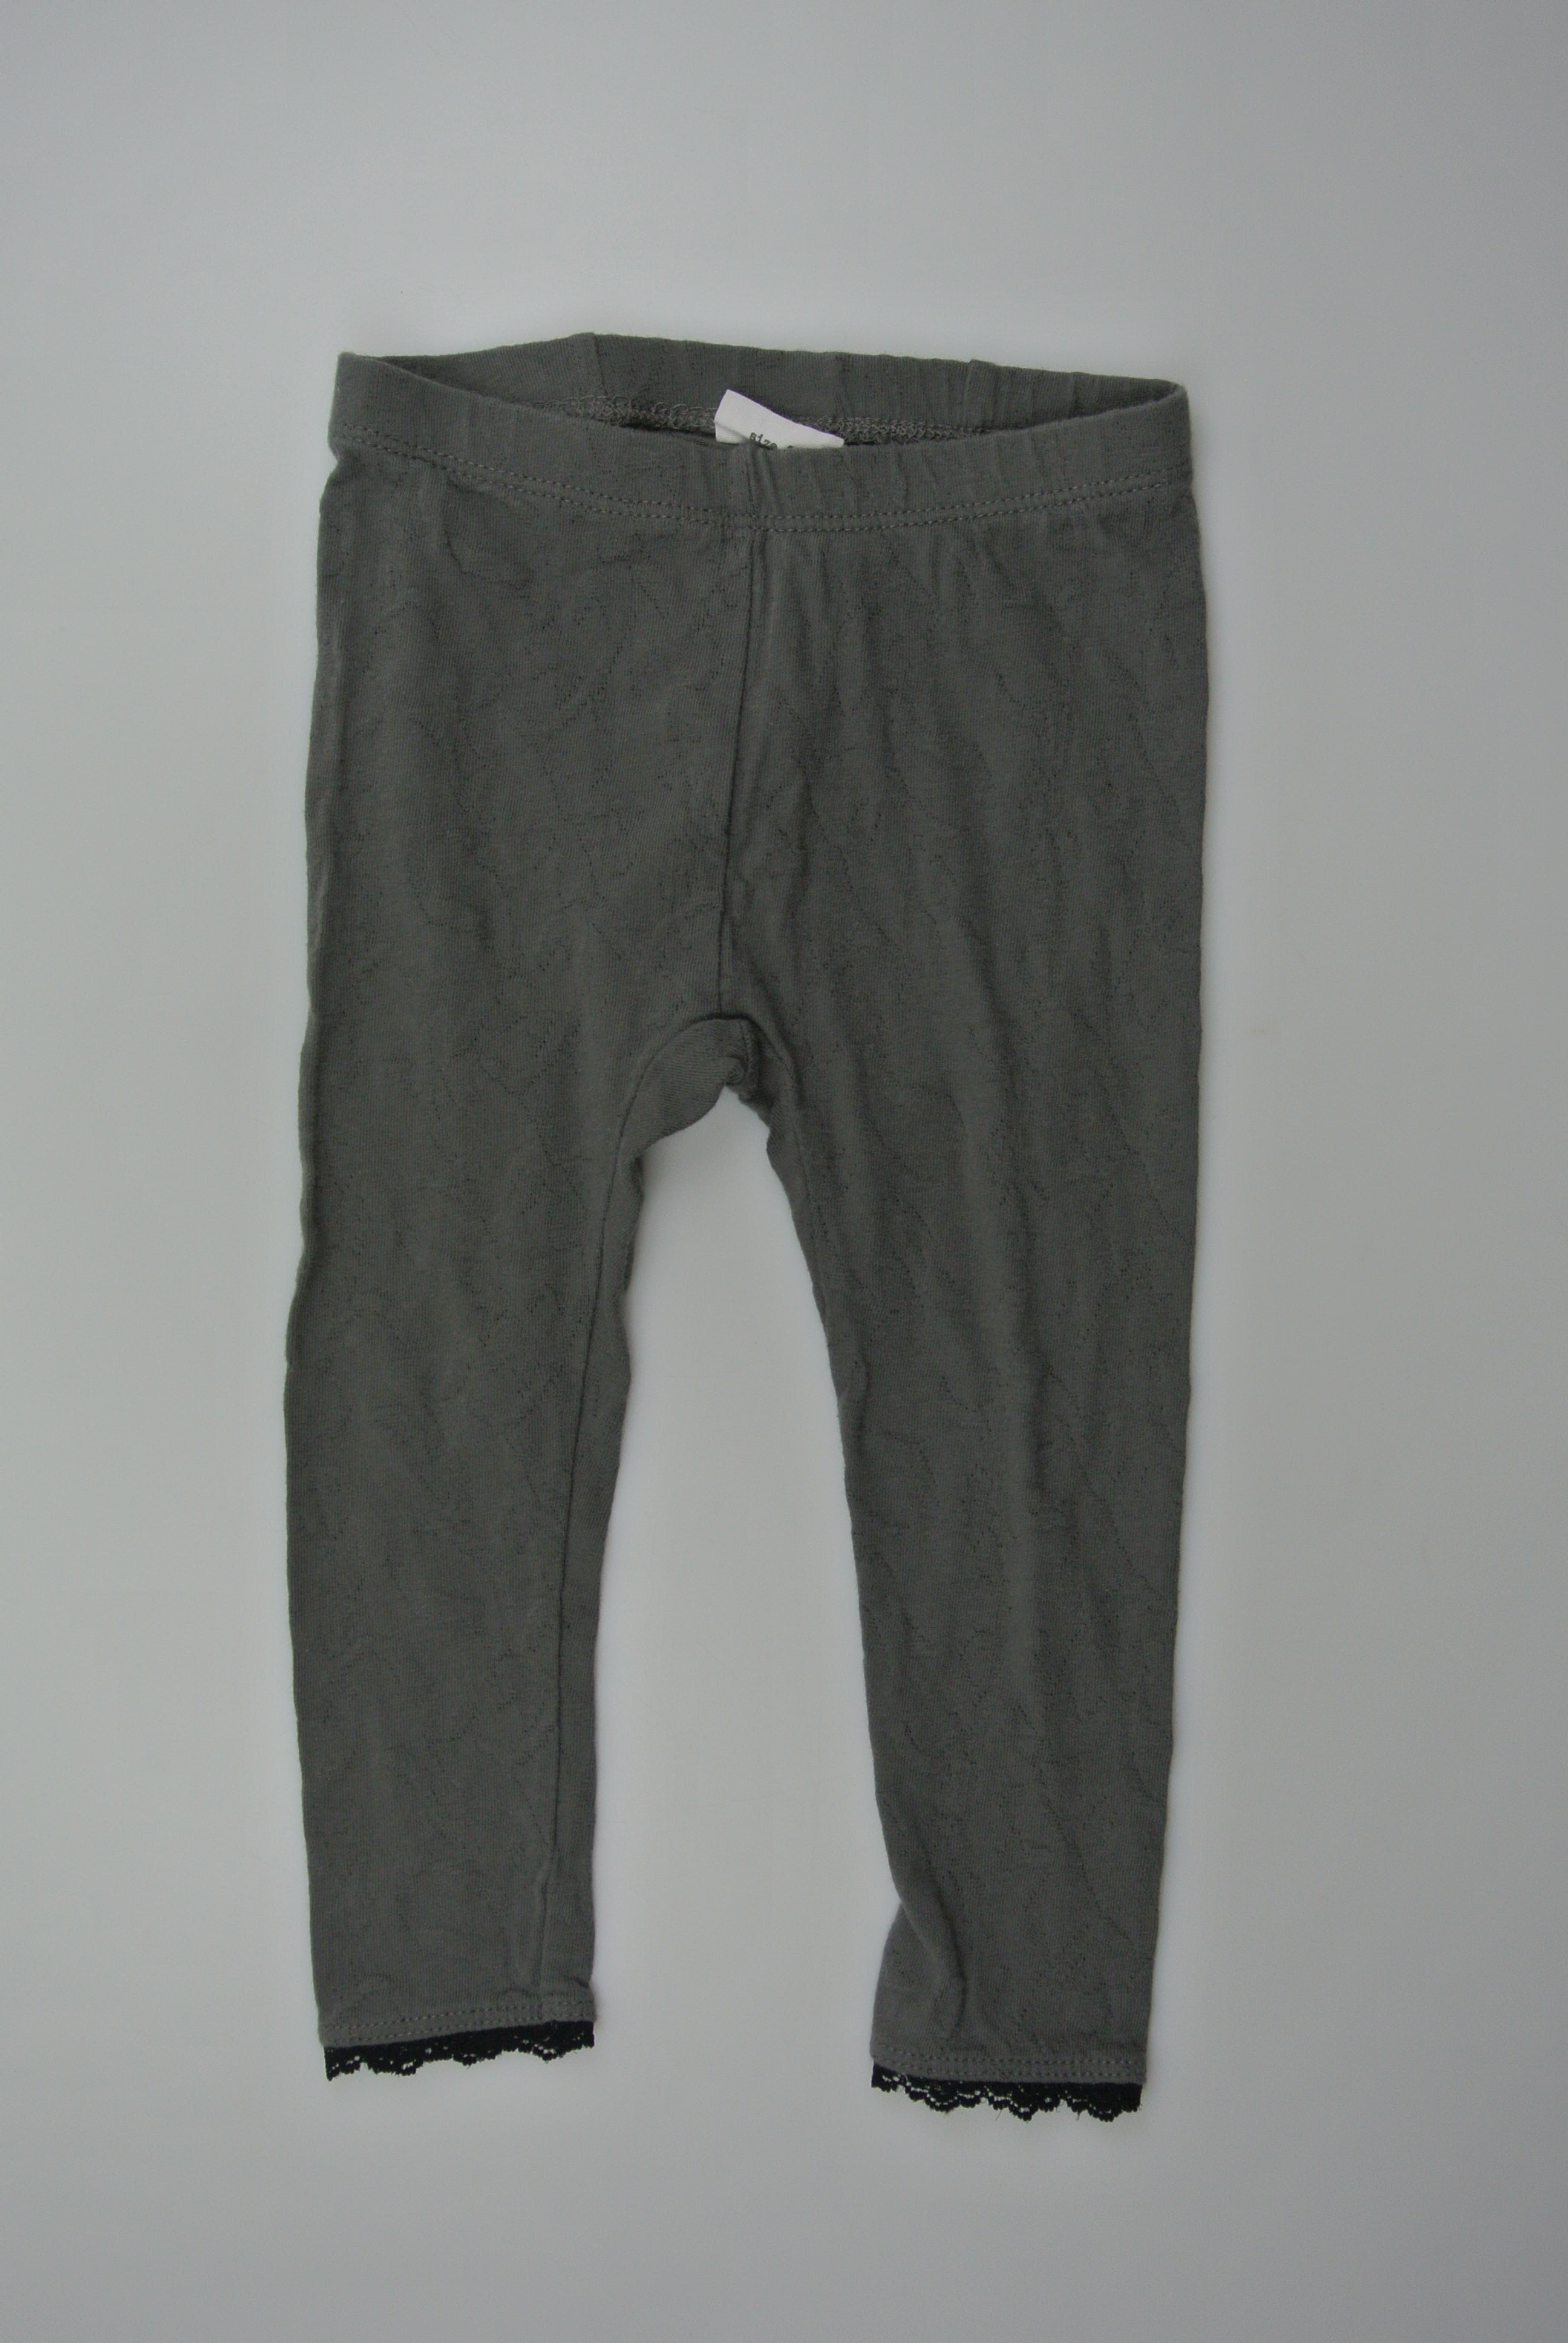 En-fant bukser str 86 pige